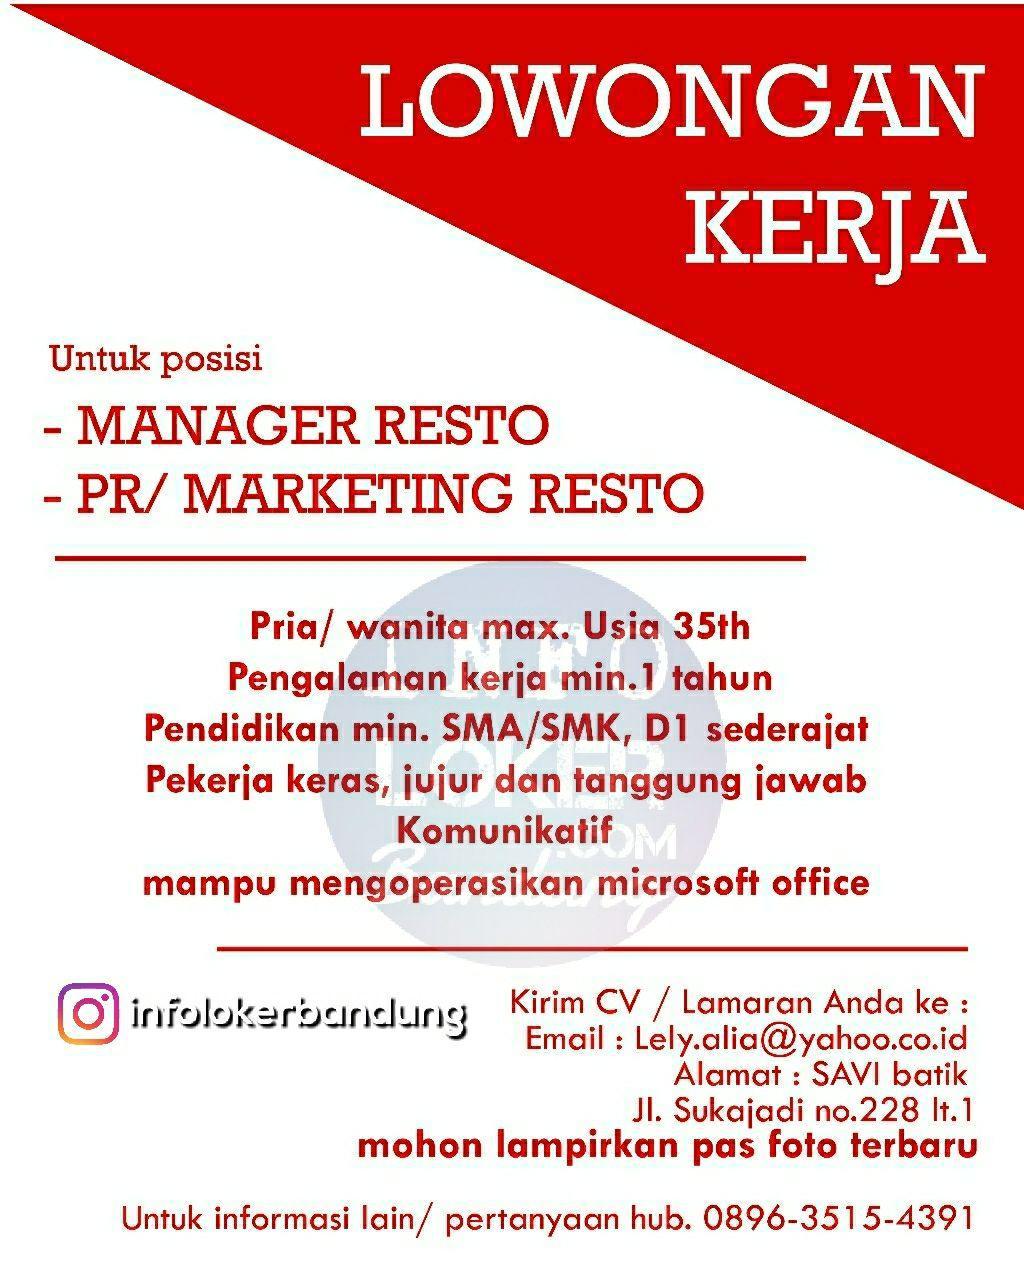 Lowongan Kerja Manager & Marketing Resto Bandung April 2018